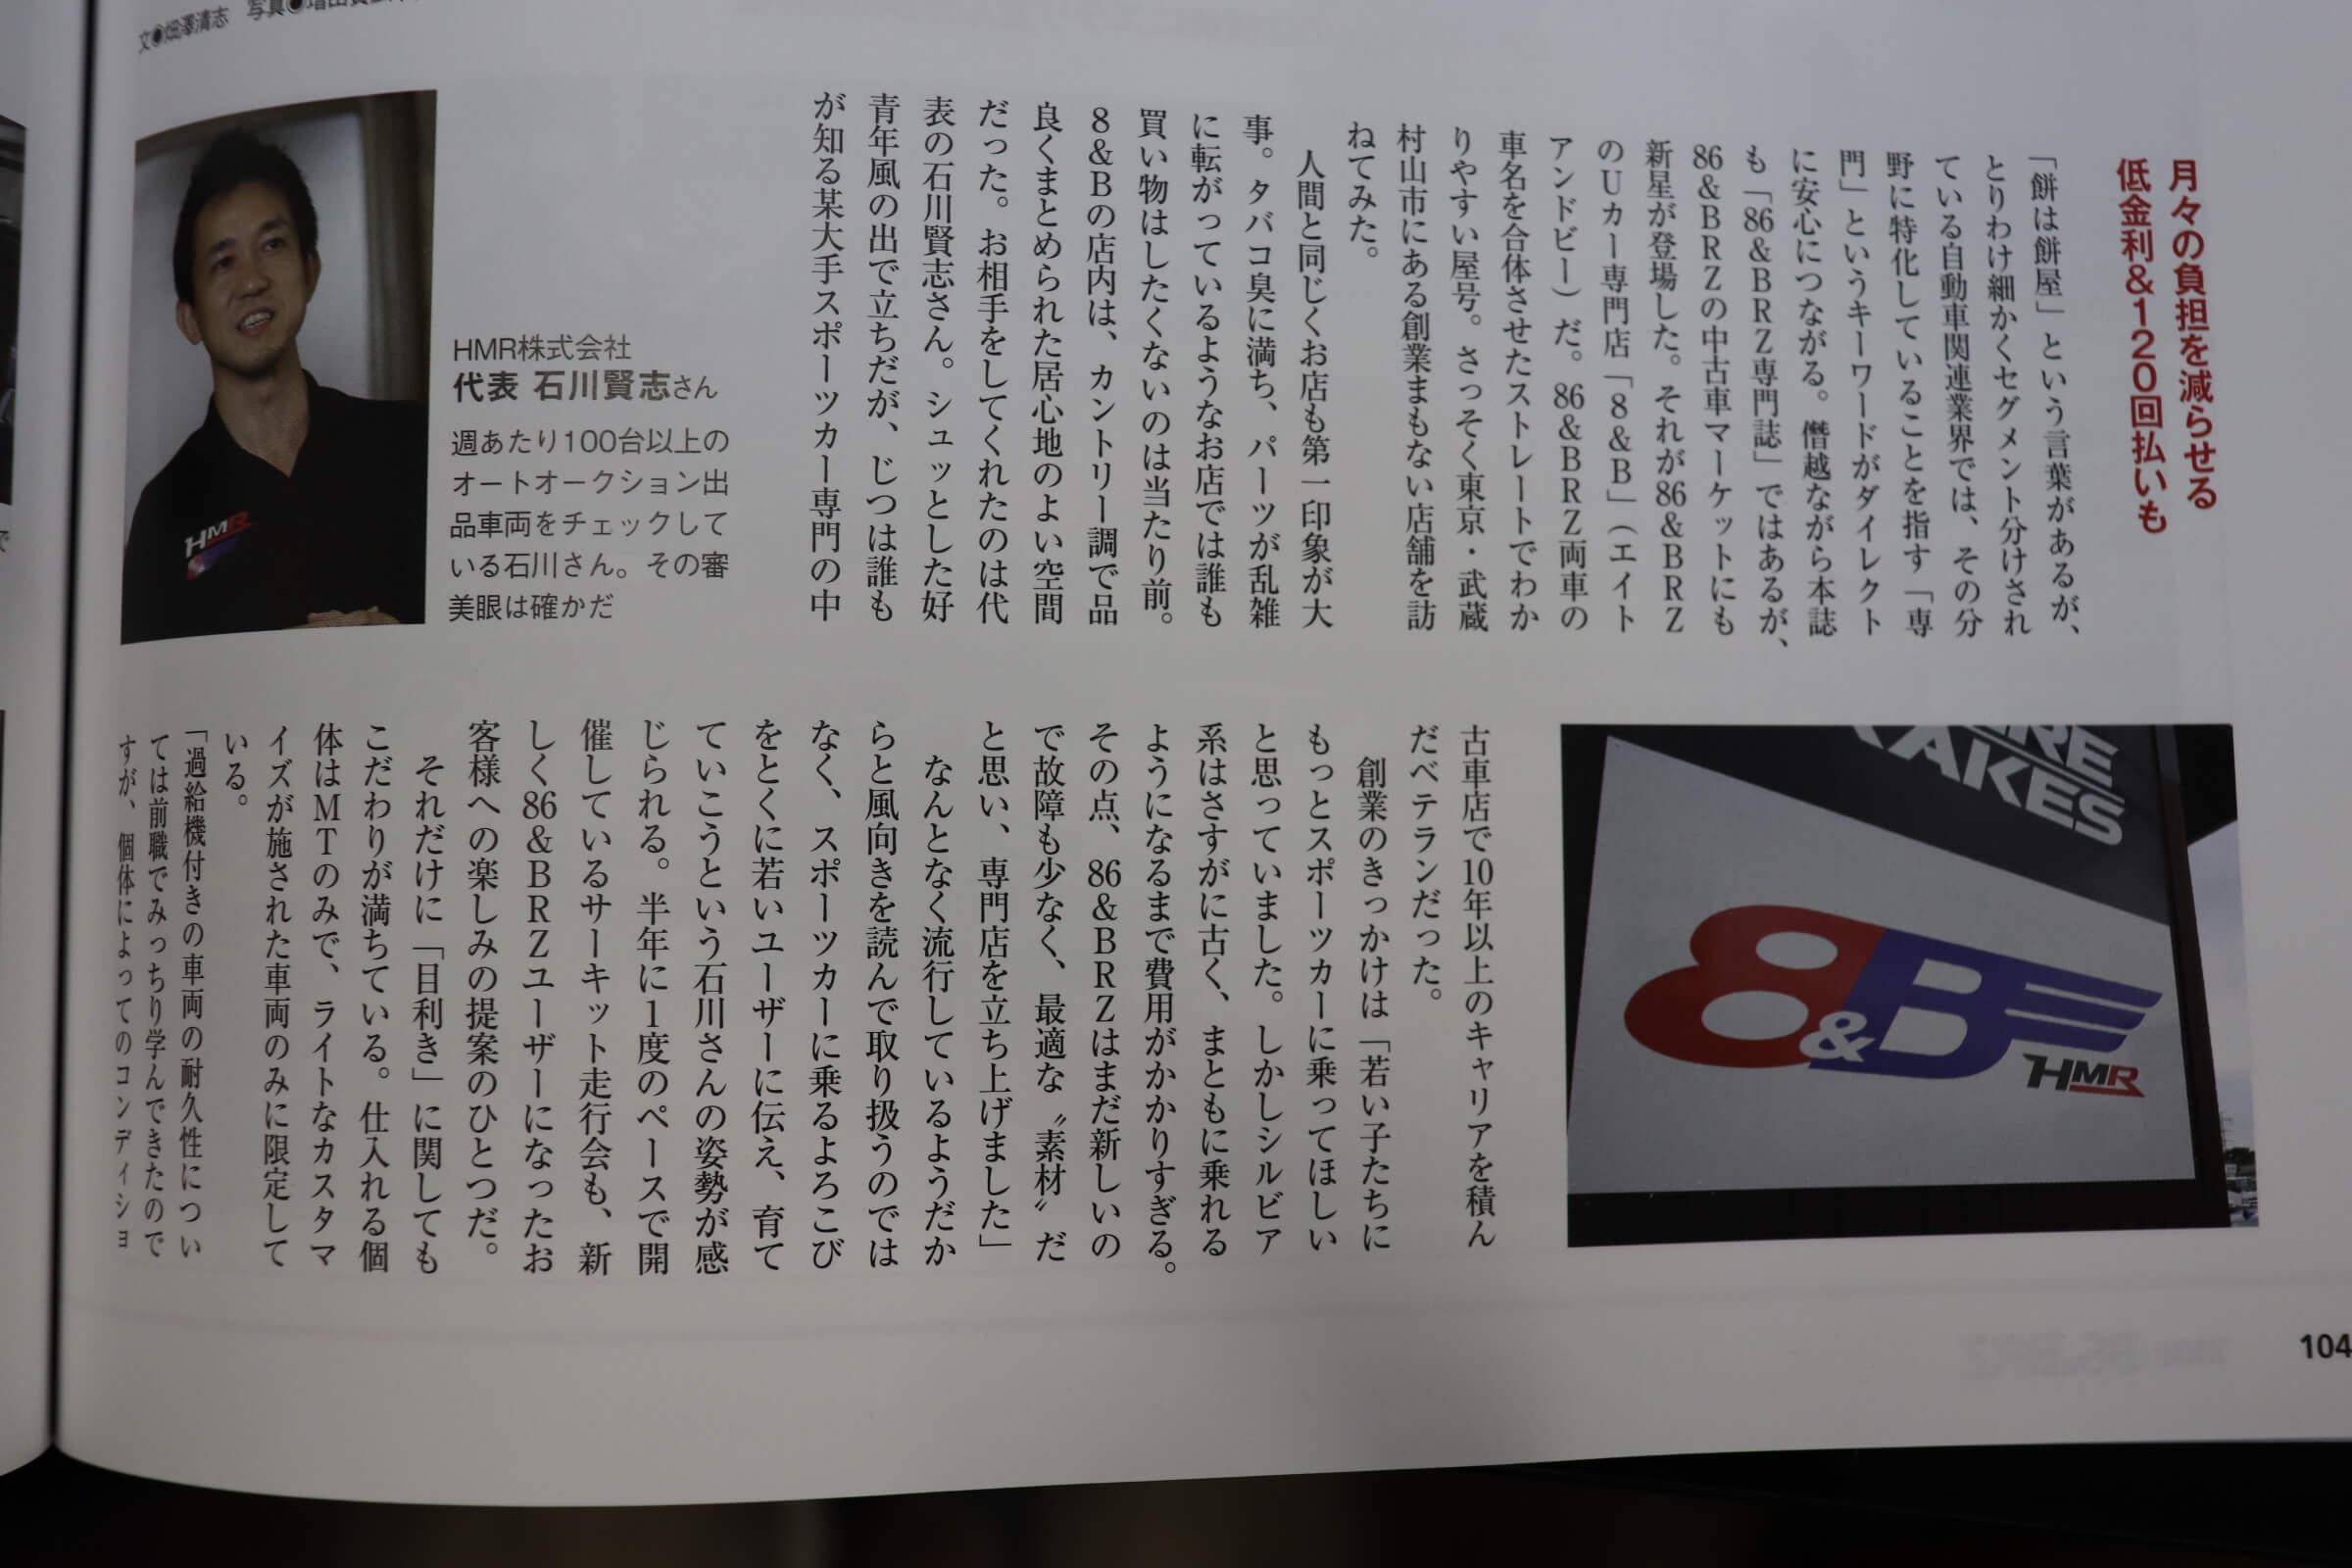 XaCAR 86&BRZマガジン 2019年10月号